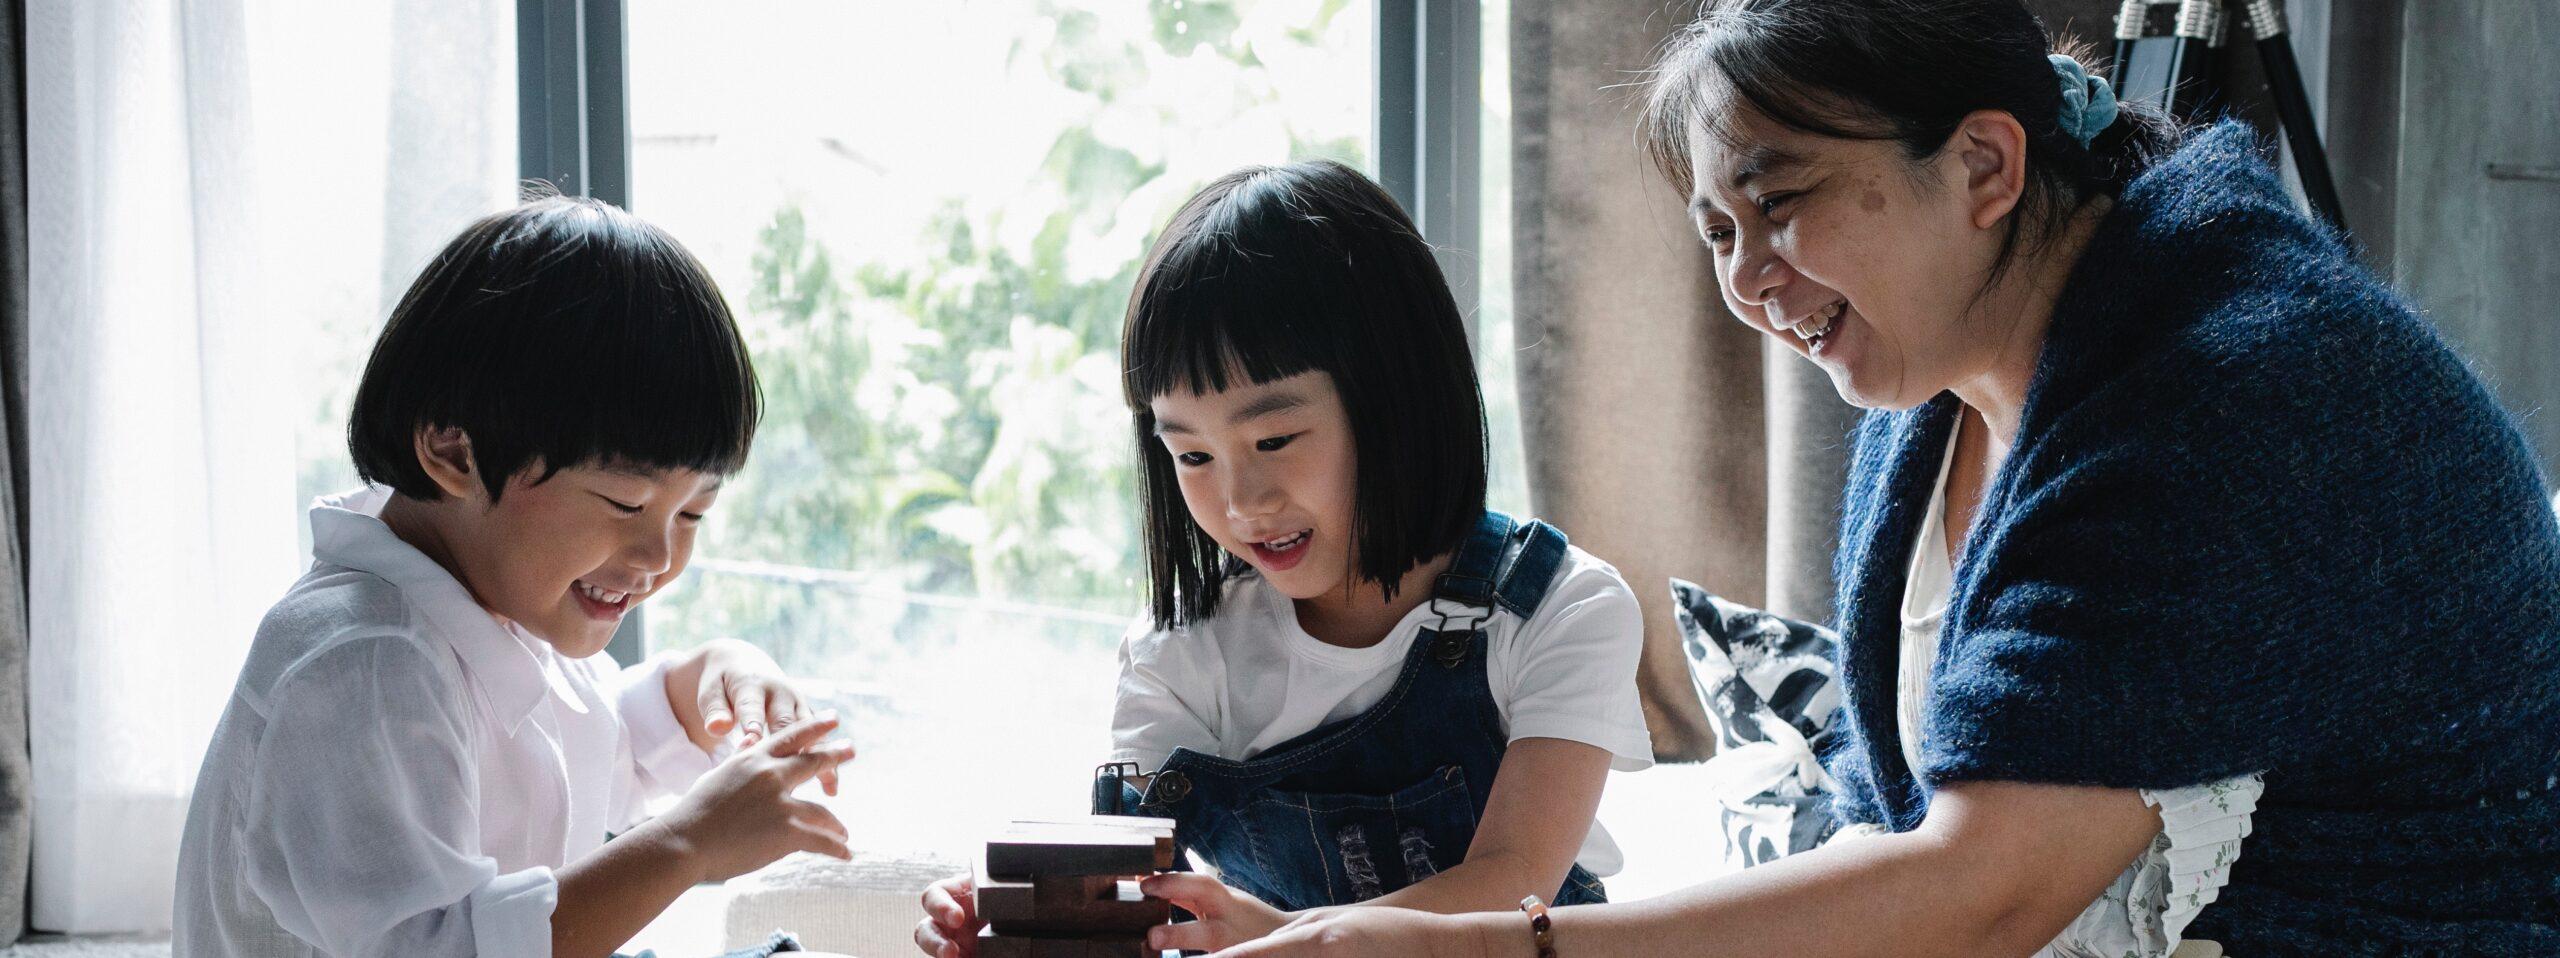 kids-with-smarthome